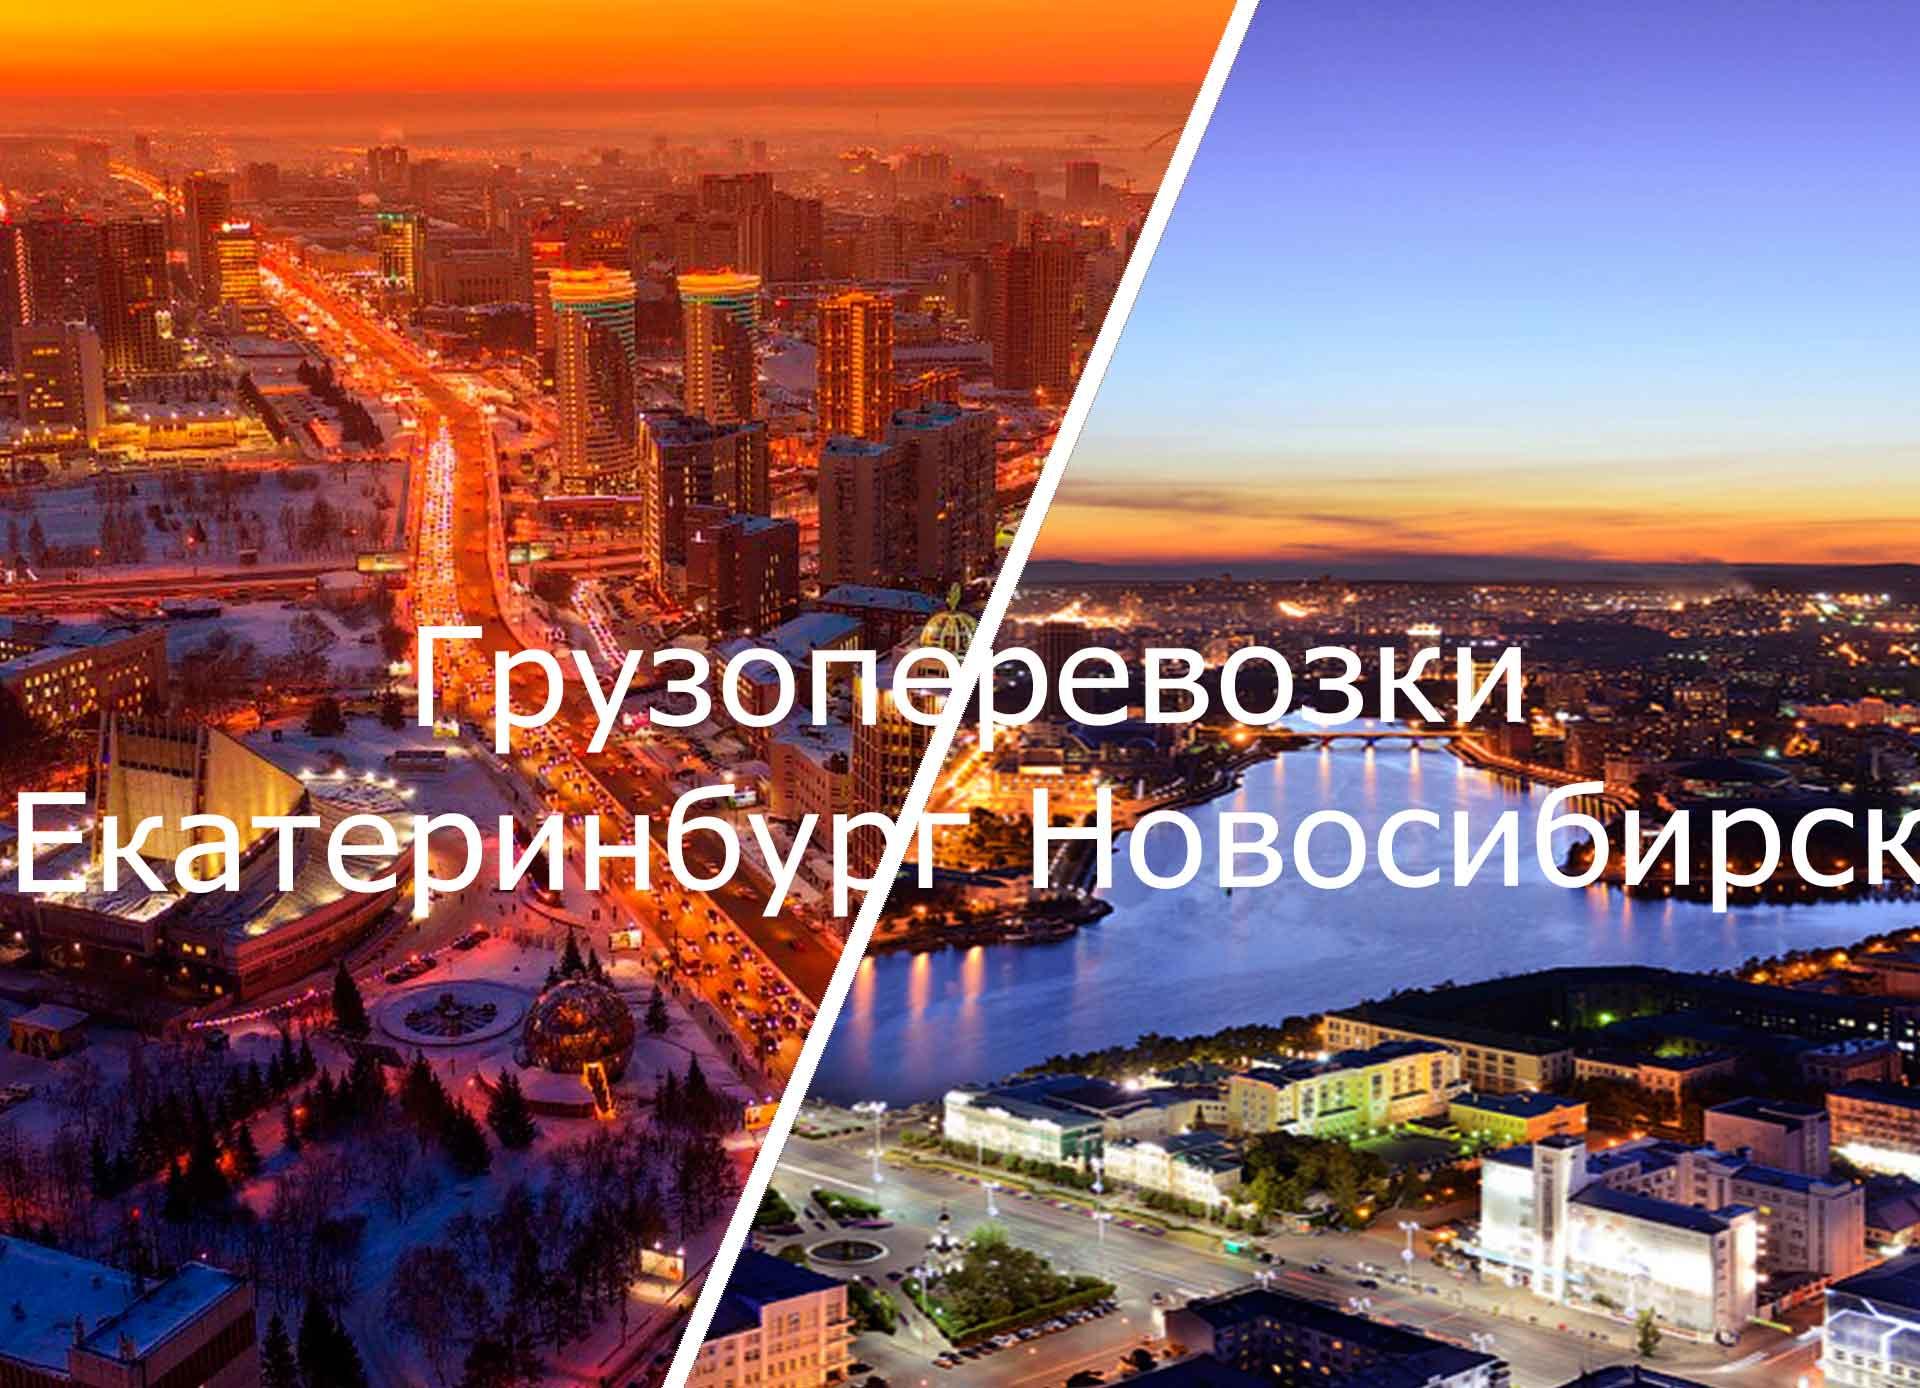 грузоперевозки екатеринбург новосибирск